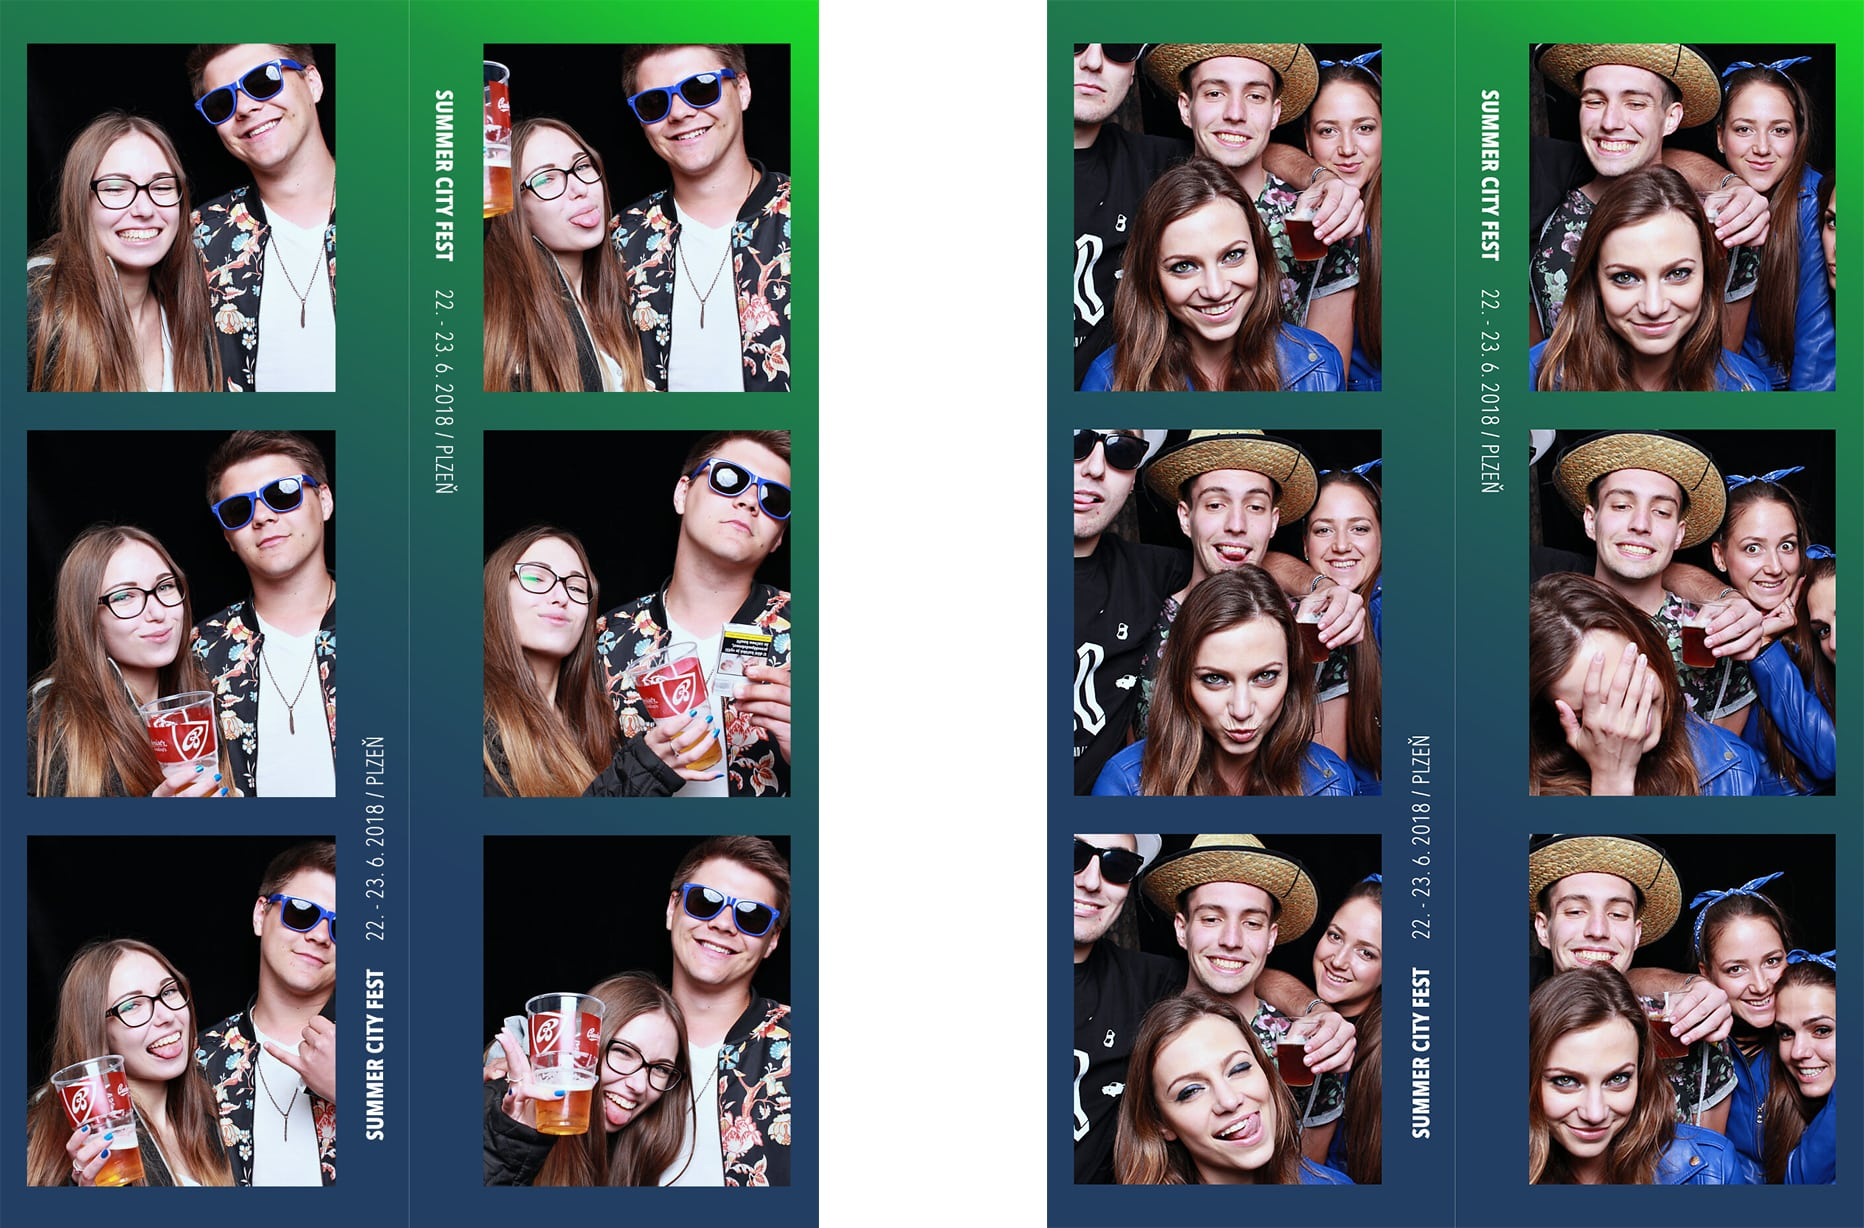 fotokoutek-coolhunters-bolevak-22-6-2018-443382